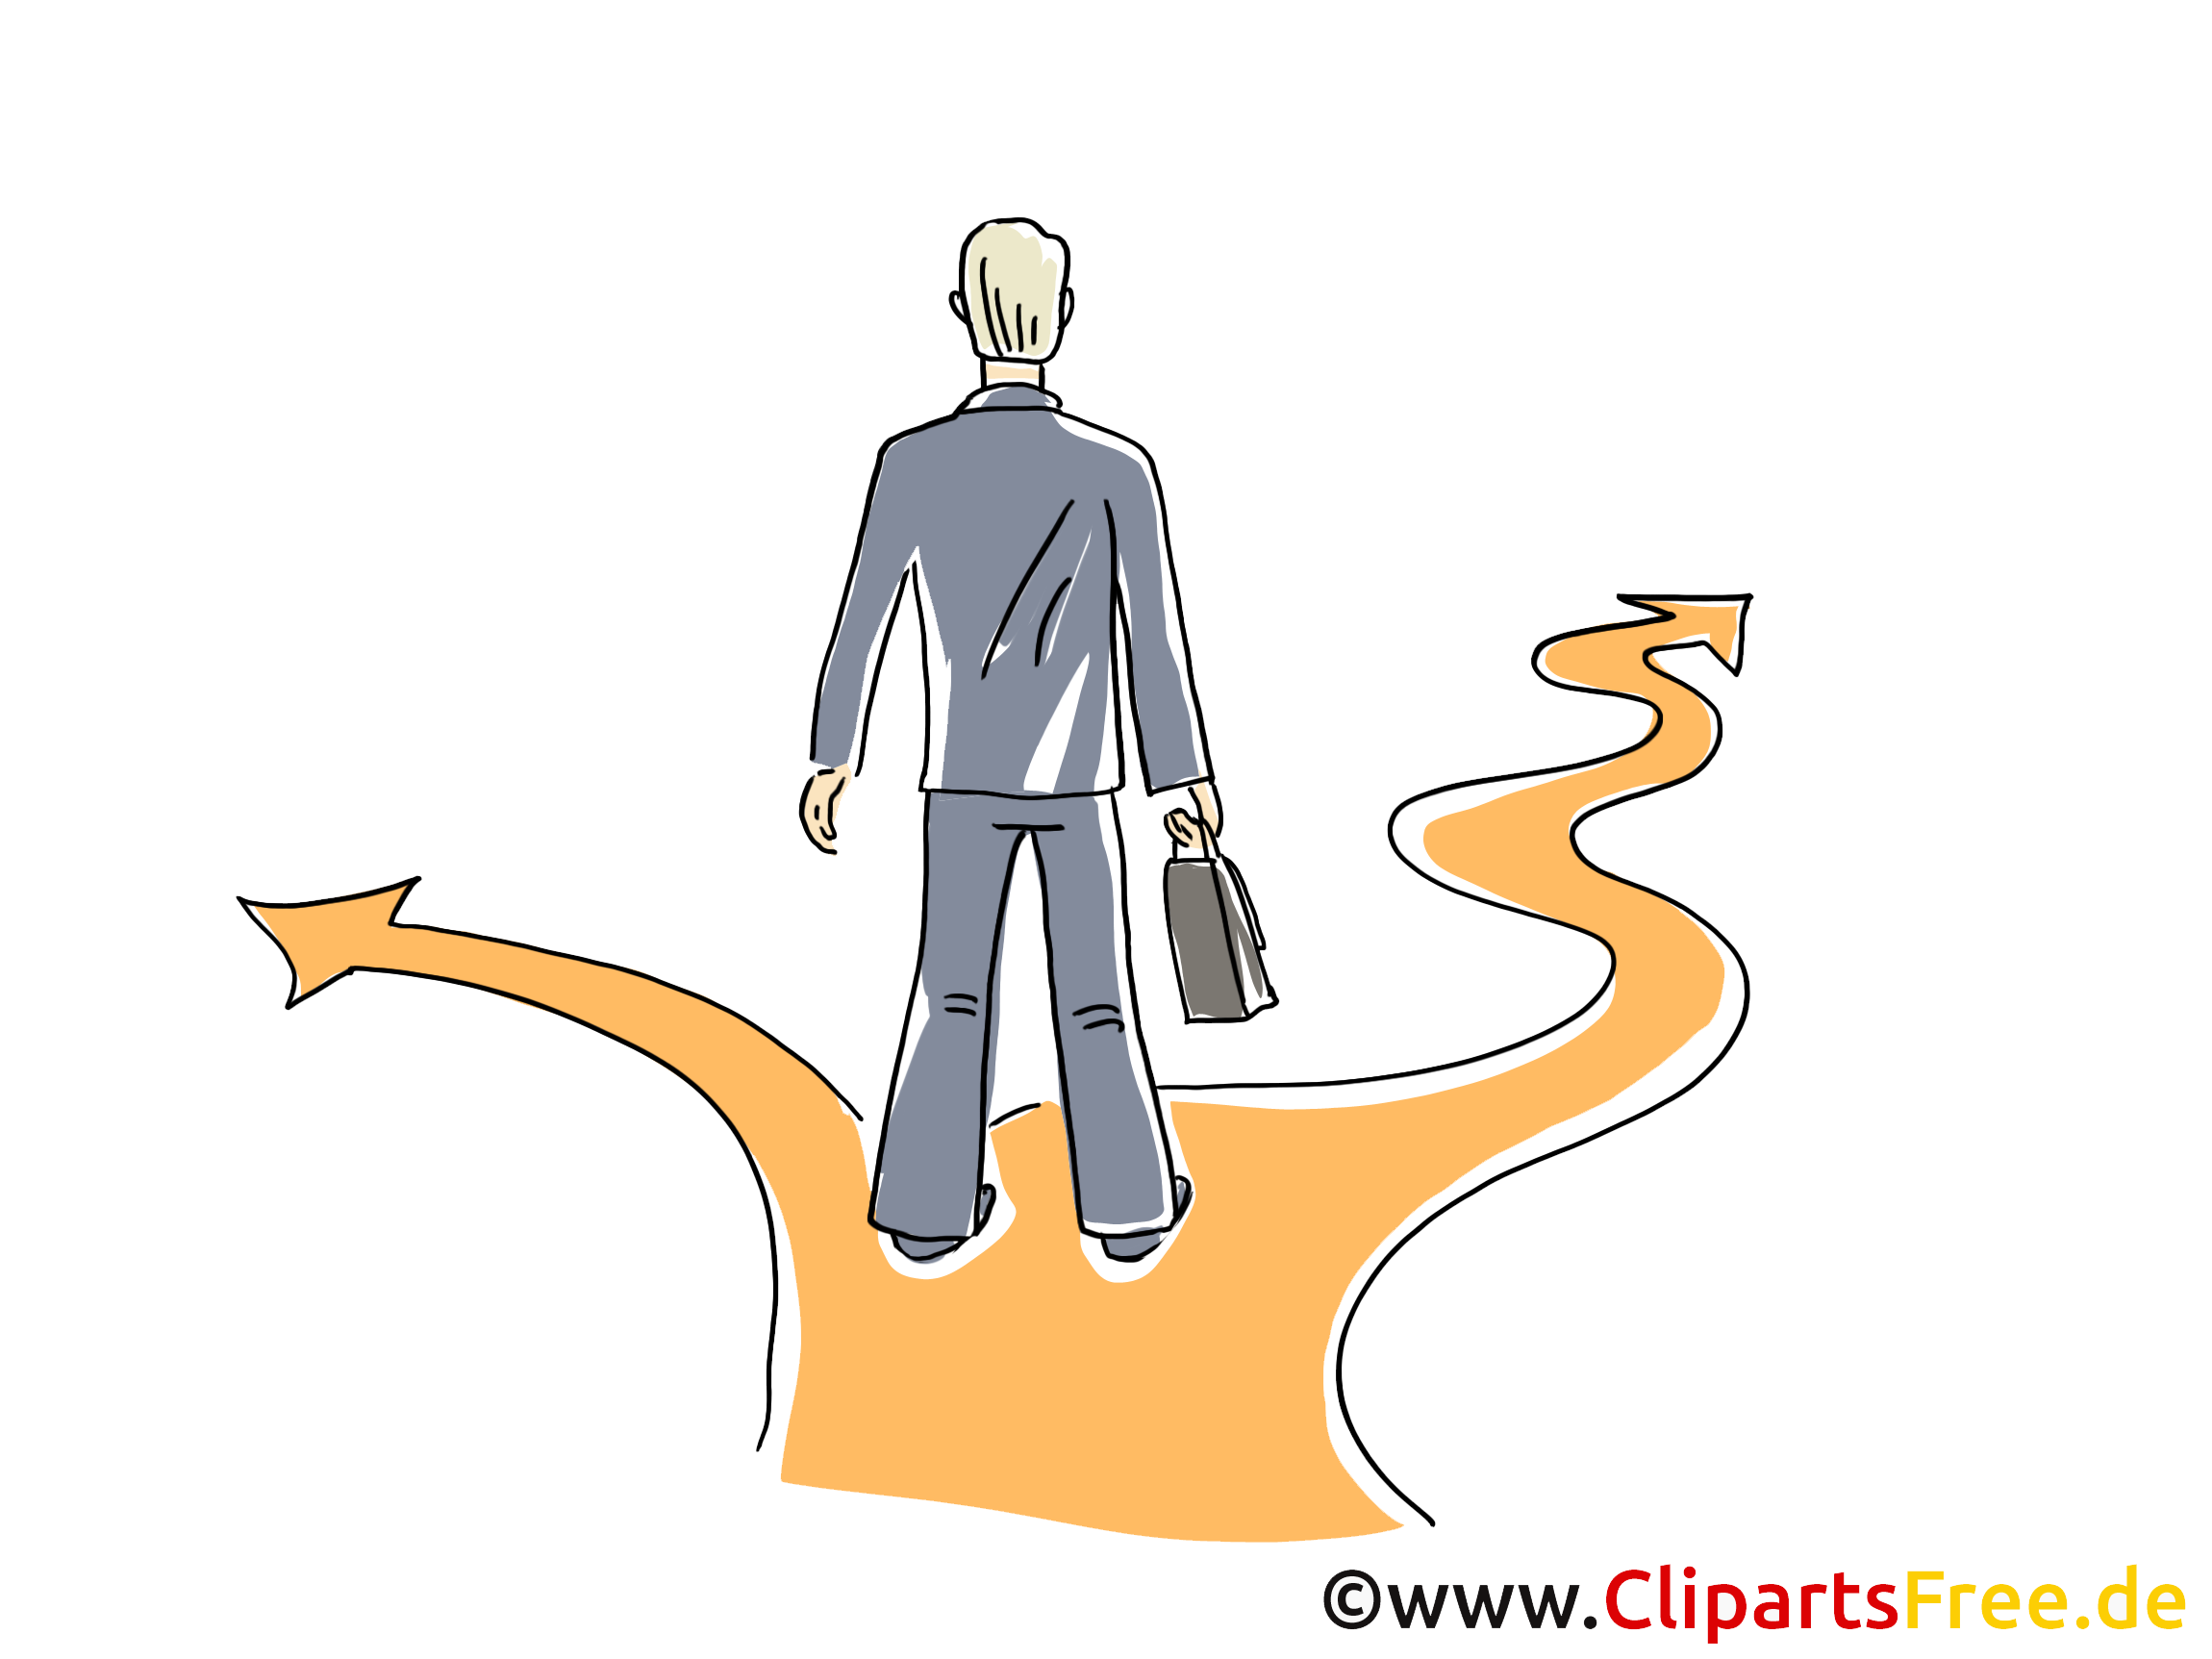 Entscheidung treffen Clipart, Grafik, Bild, Cartoon